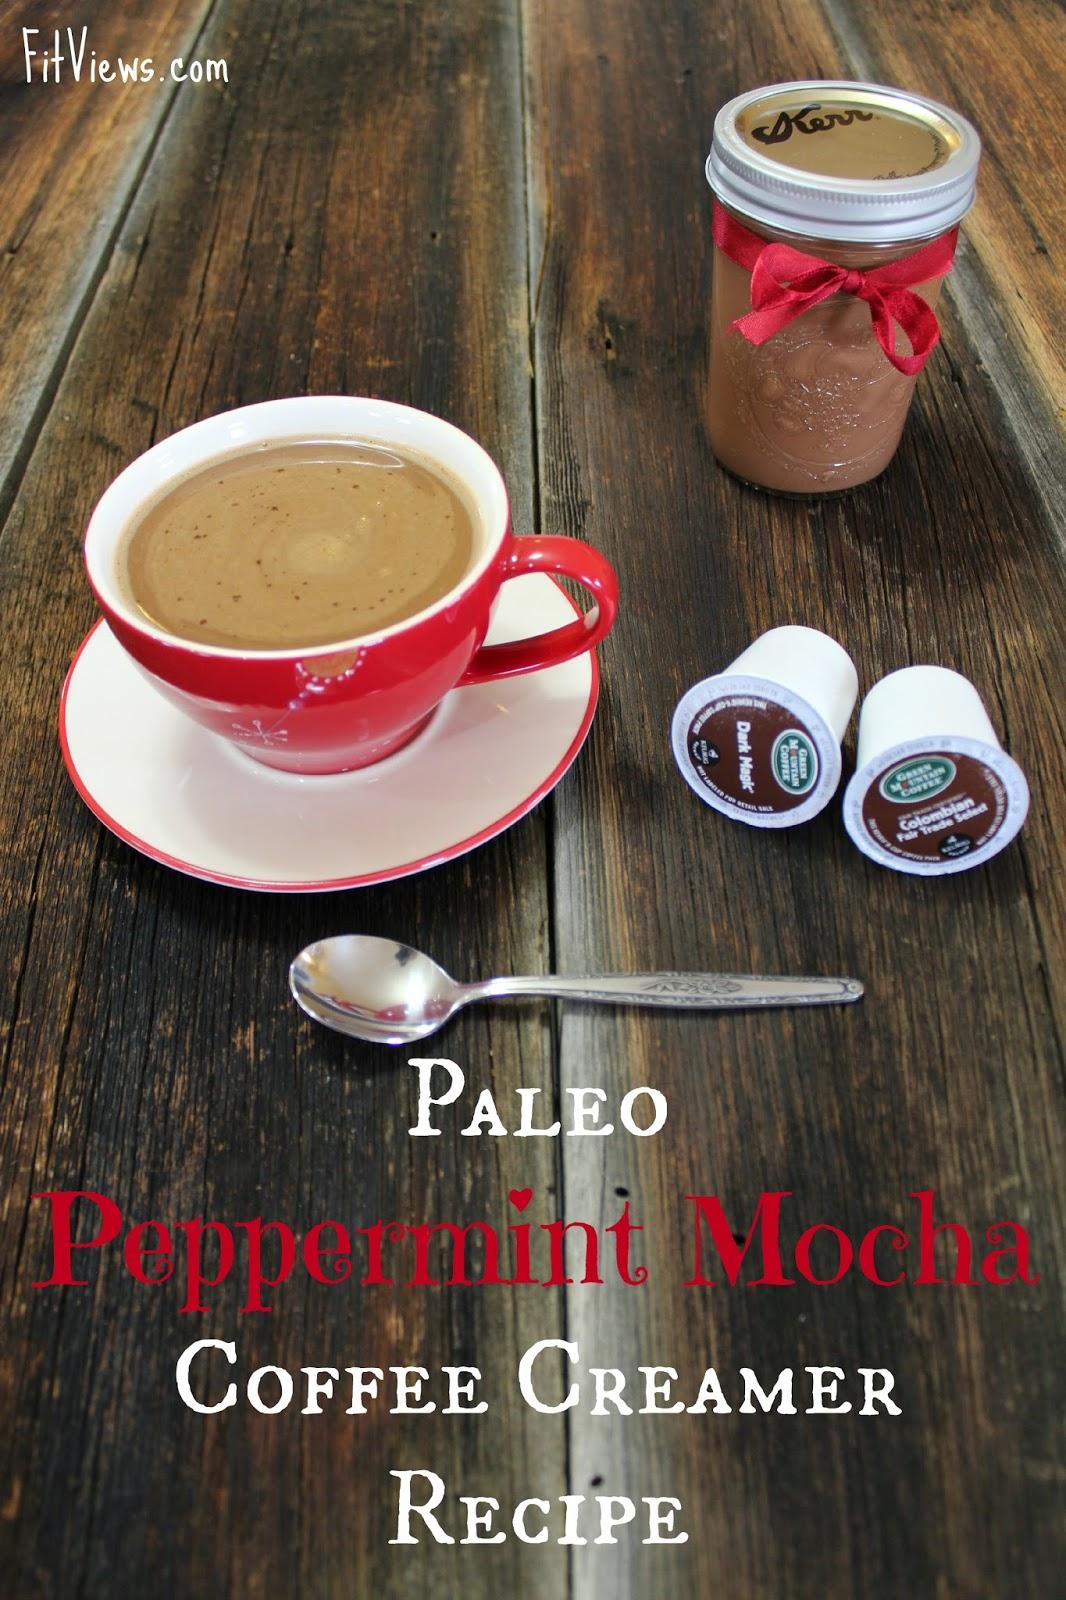 FitViews Paleo Peppermint Mocha Coffee Creamer Recipe